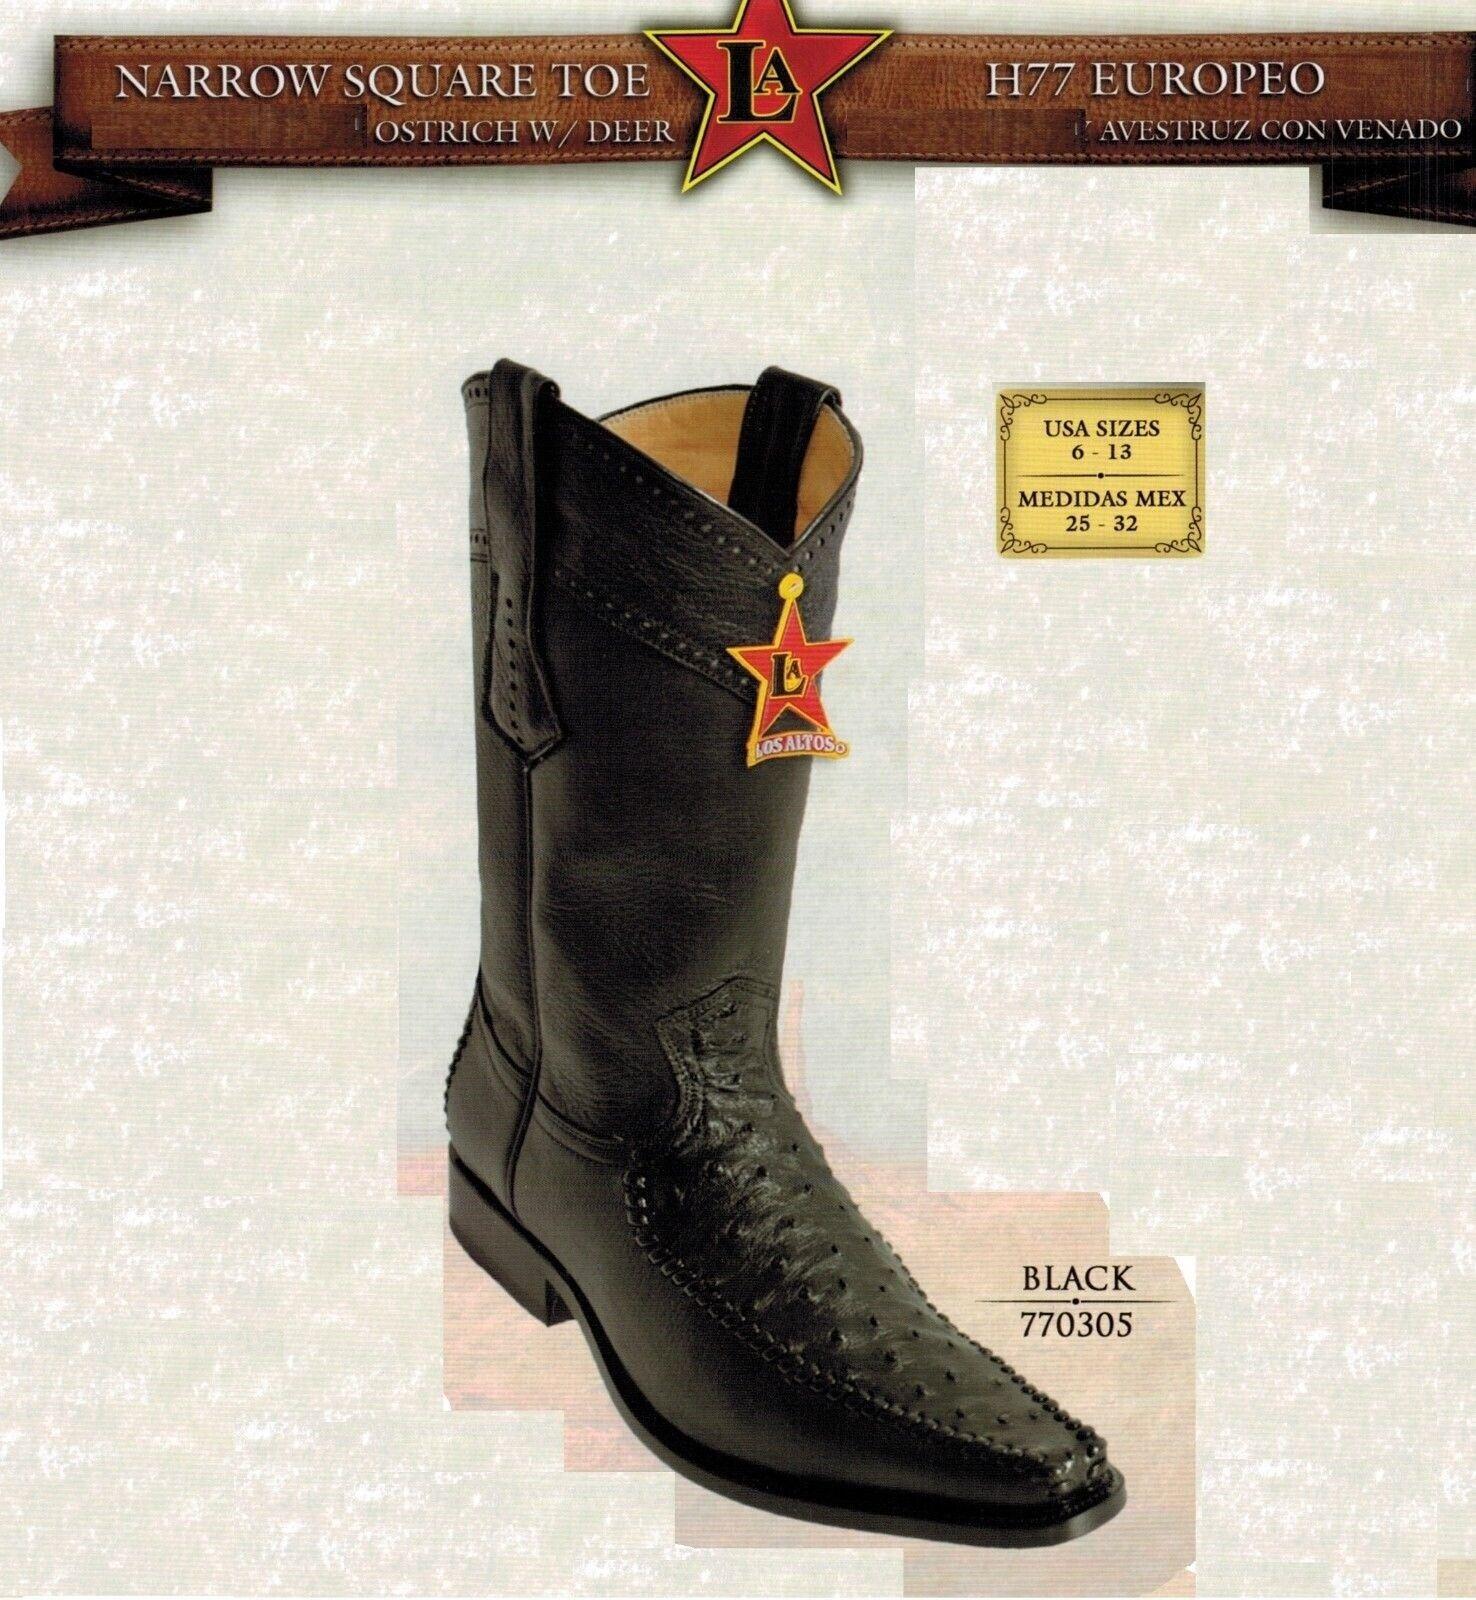 Los Altos Men's Narrow Square Toe Ostrich Cowboy Western stivali